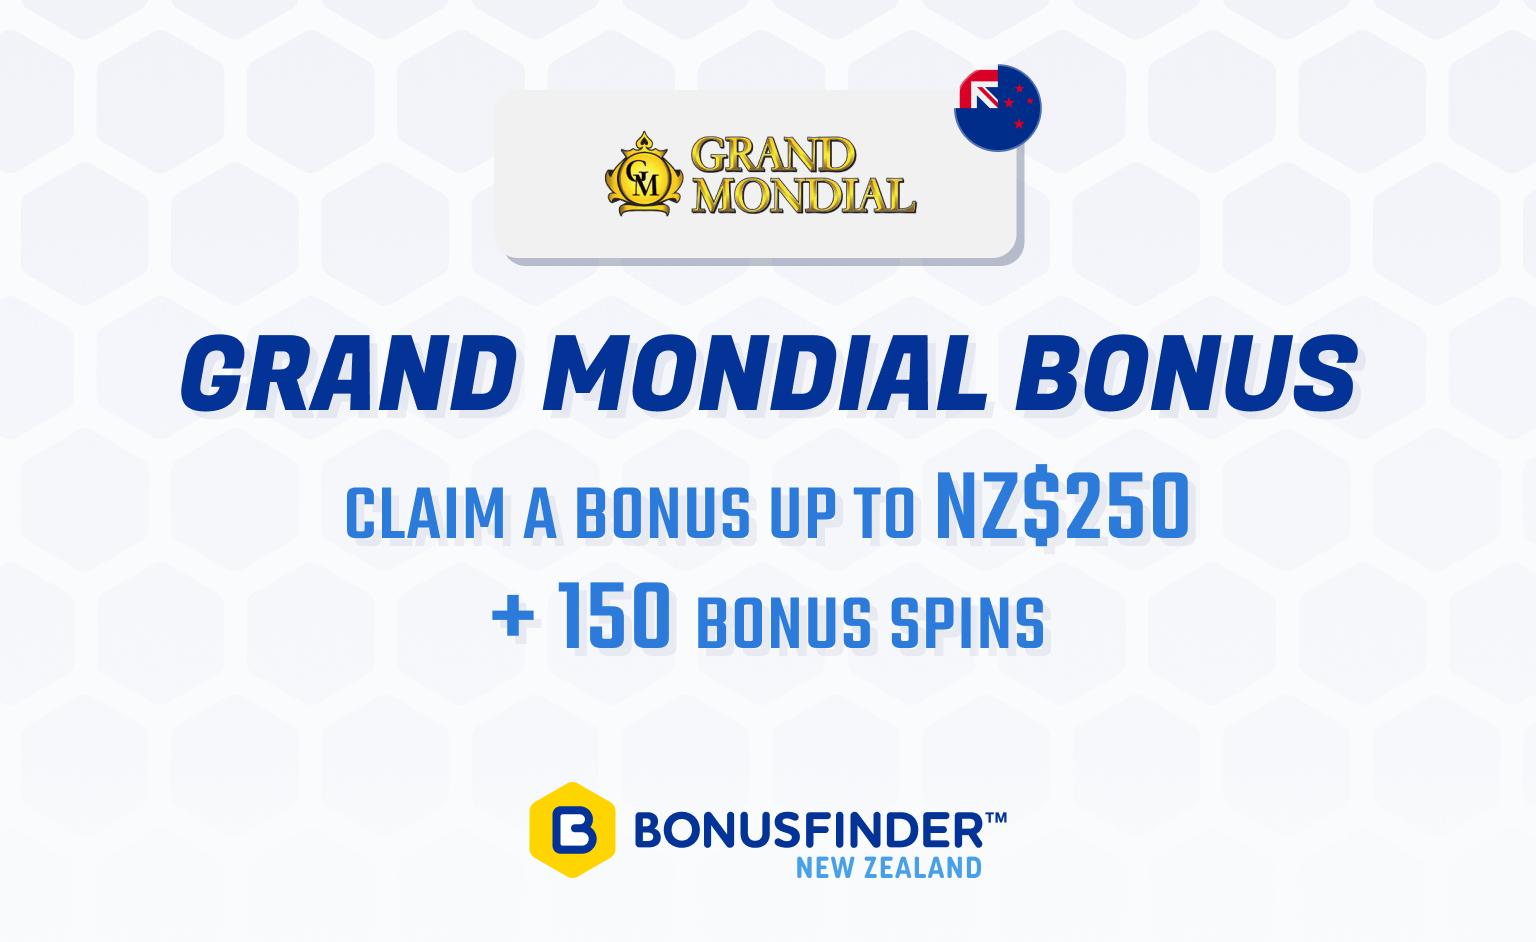 Grand Mondial bonus